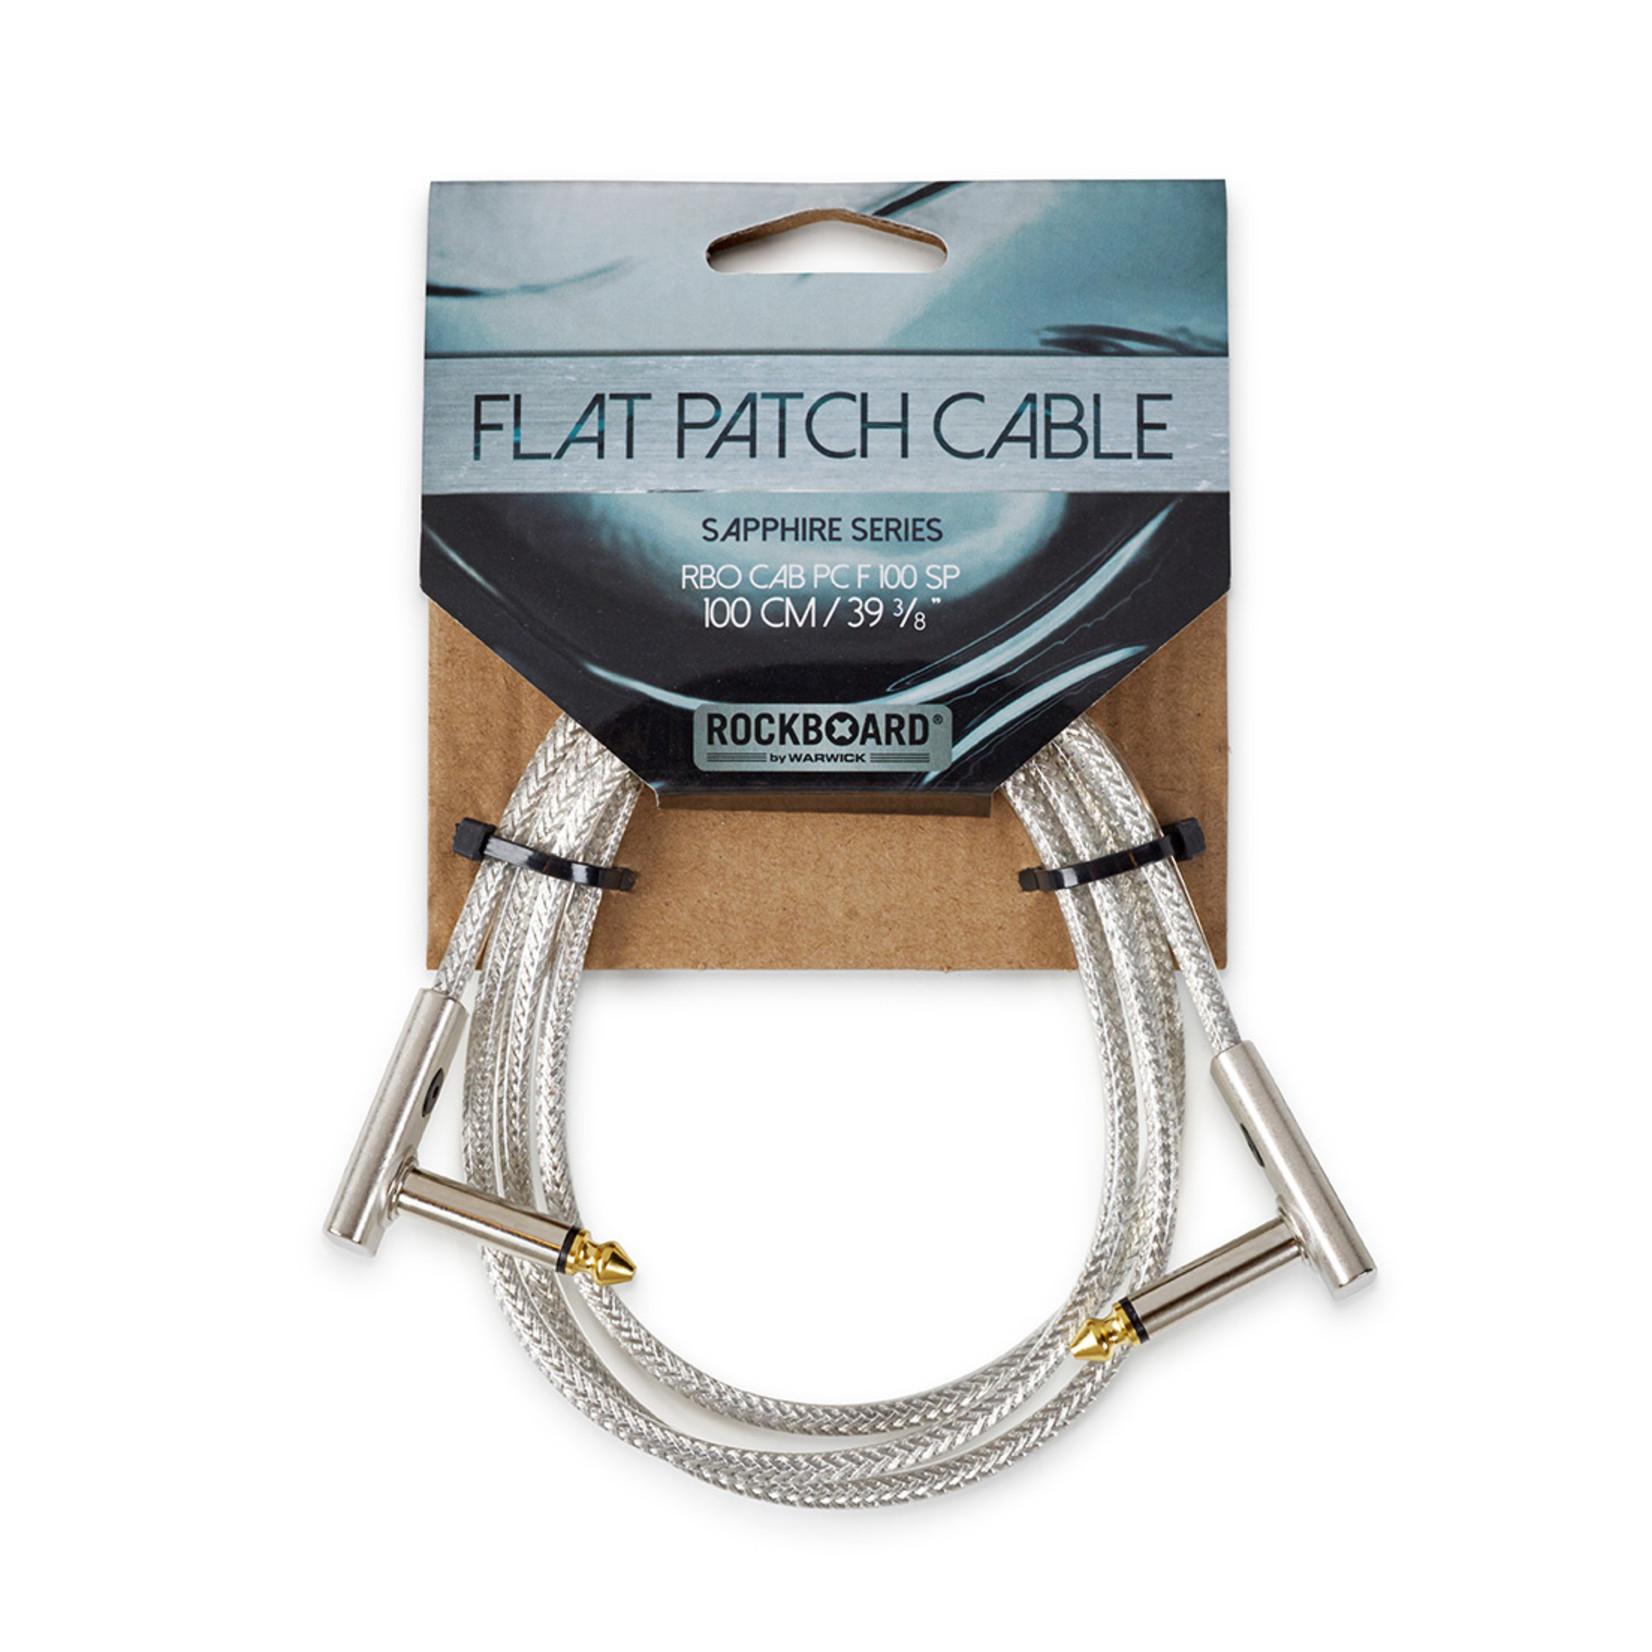 "Rockboard RockBoard Flat Patch Cable Sapphire Series - 100 cm / 39 3/8"""